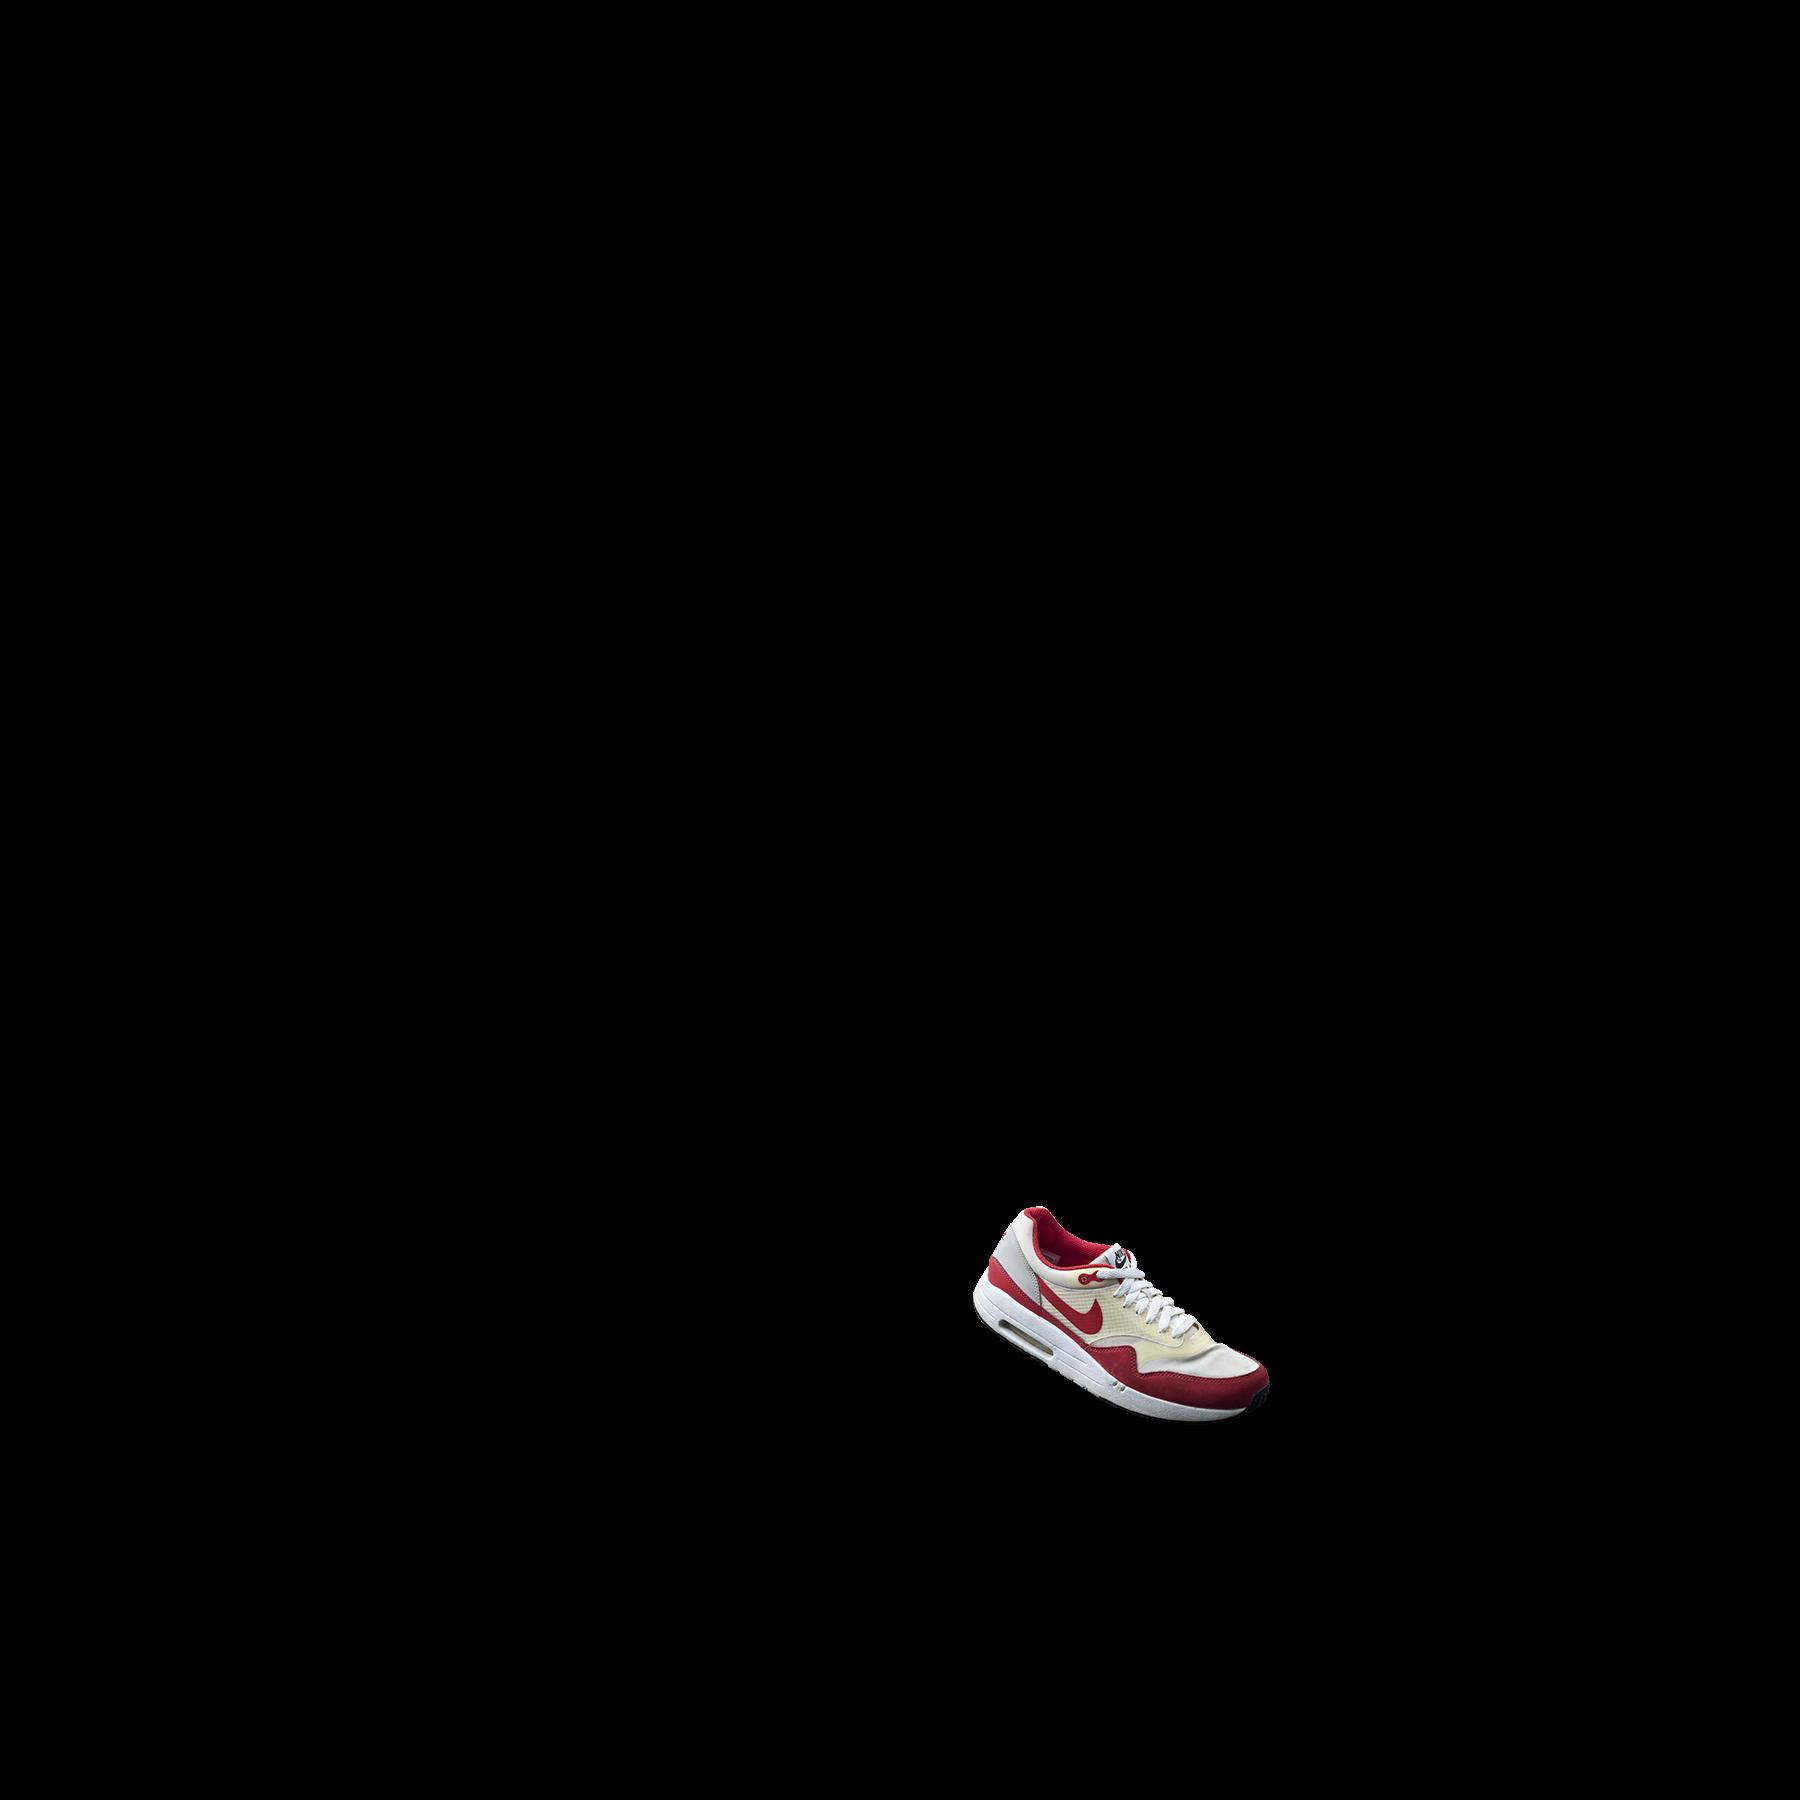 scarpa6